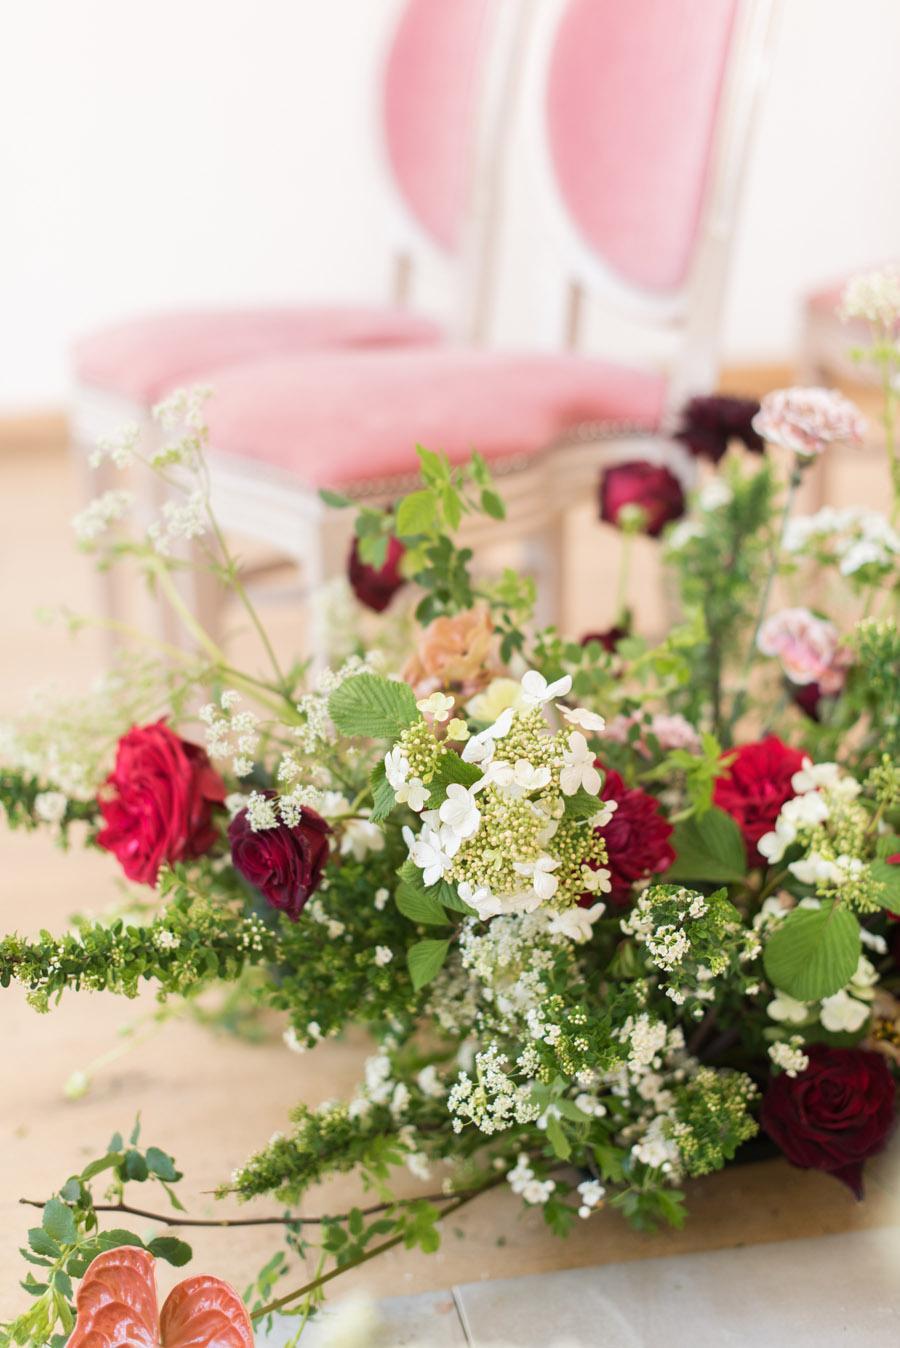 floral wedding ideas at Millbridge Court on English Wedding - photo credit Julie Michaelsen Photography (11)